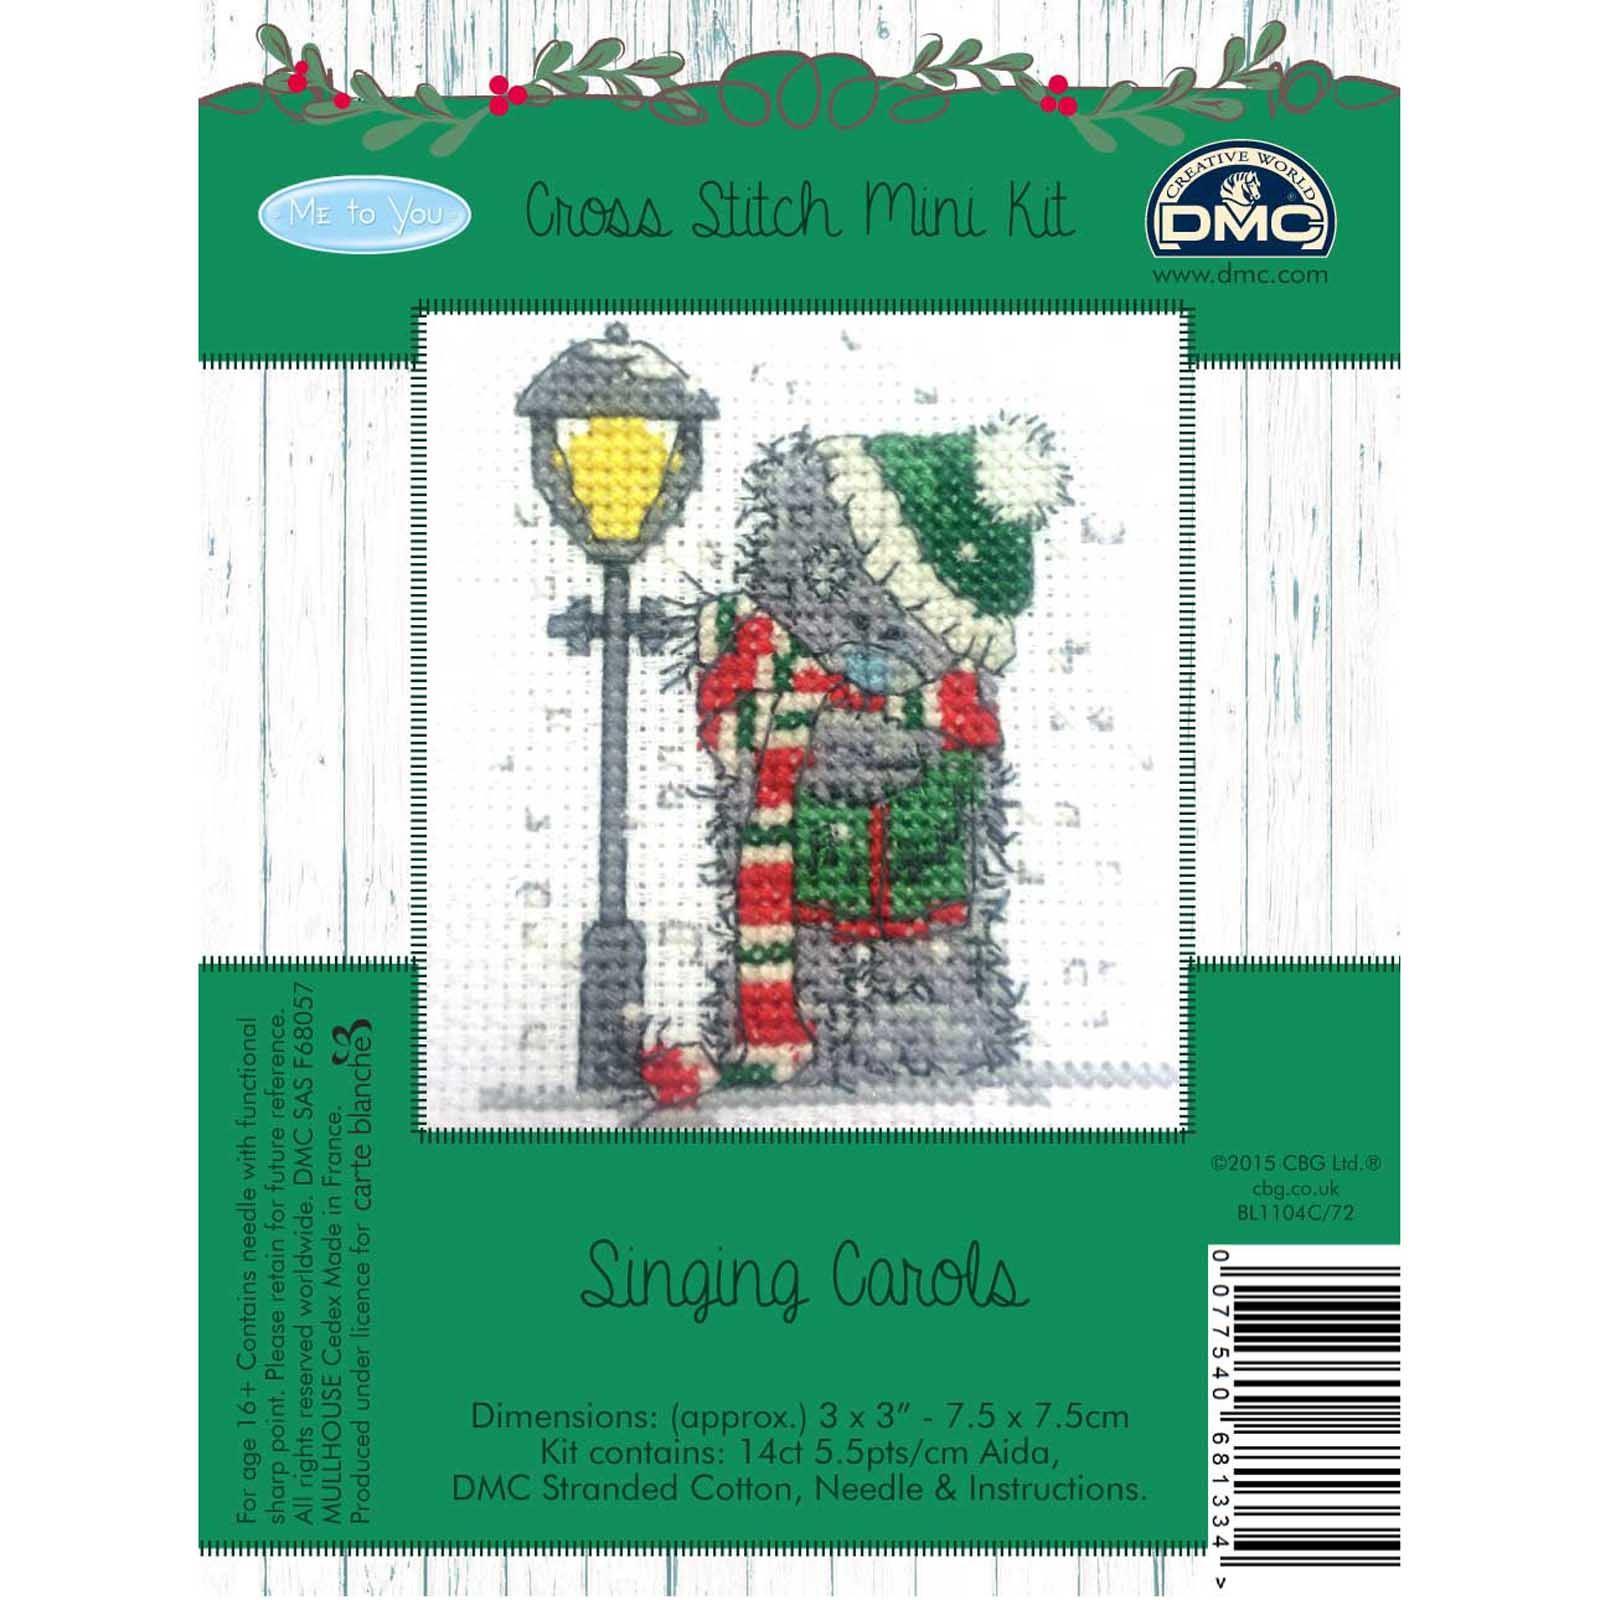 DMC-Me-to-You-Tatty-Teddy-Christmas-Mini-Cross-Stitch-Kits-8-Designs thumbnail 17